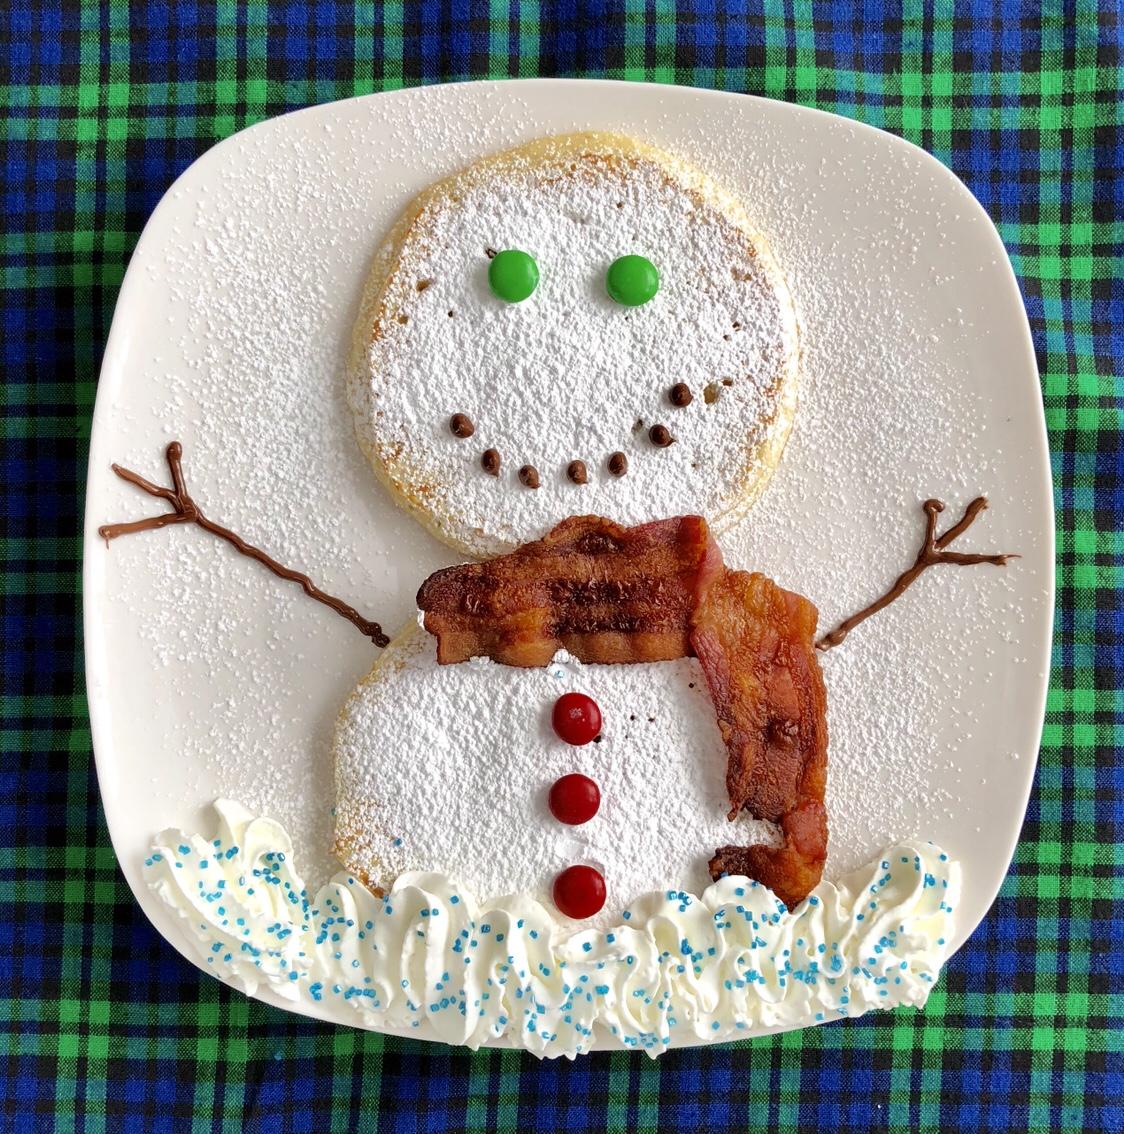 Snowman Pancakes by Happylifeblogspot.com #pancakes #pancakeart #snowman #snowmanpancakes #snowday #christmasbreakfast #breakfast